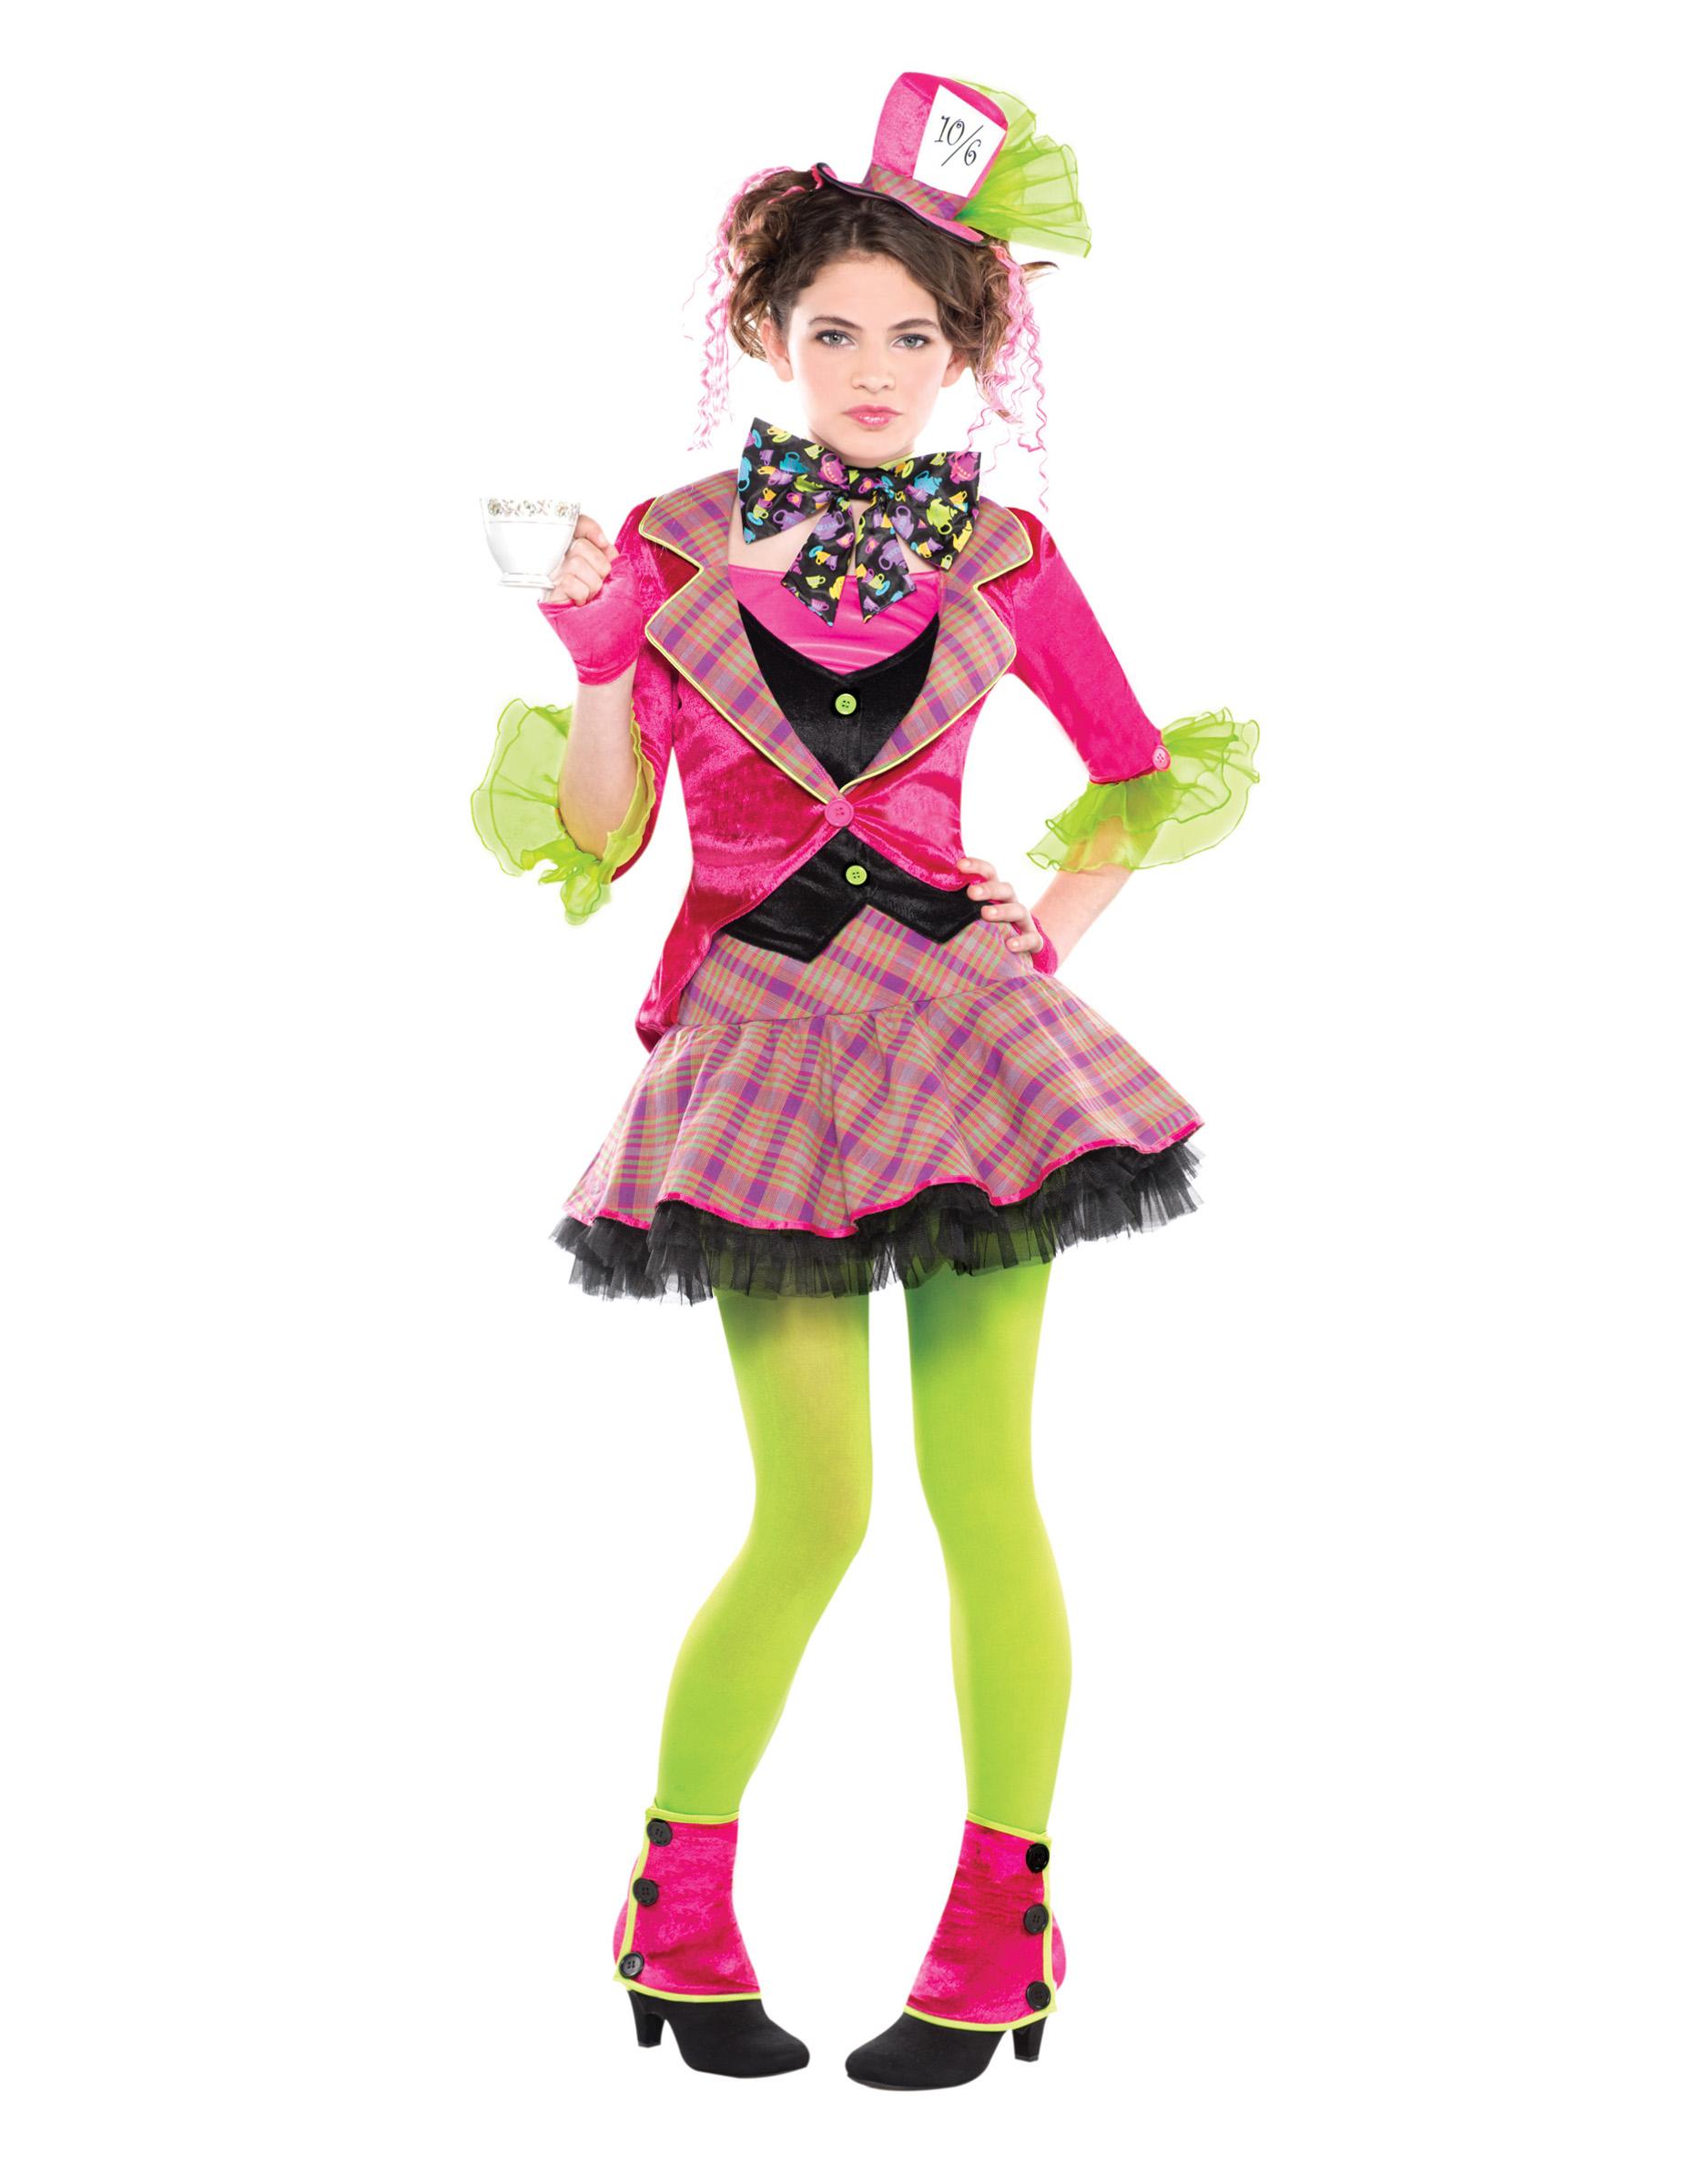 hutmacherin kost m f r m dchen fasching pink gr n g nstige faschings kost me bei karneval. Black Bedroom Furniture Sets. Home Design Ideas